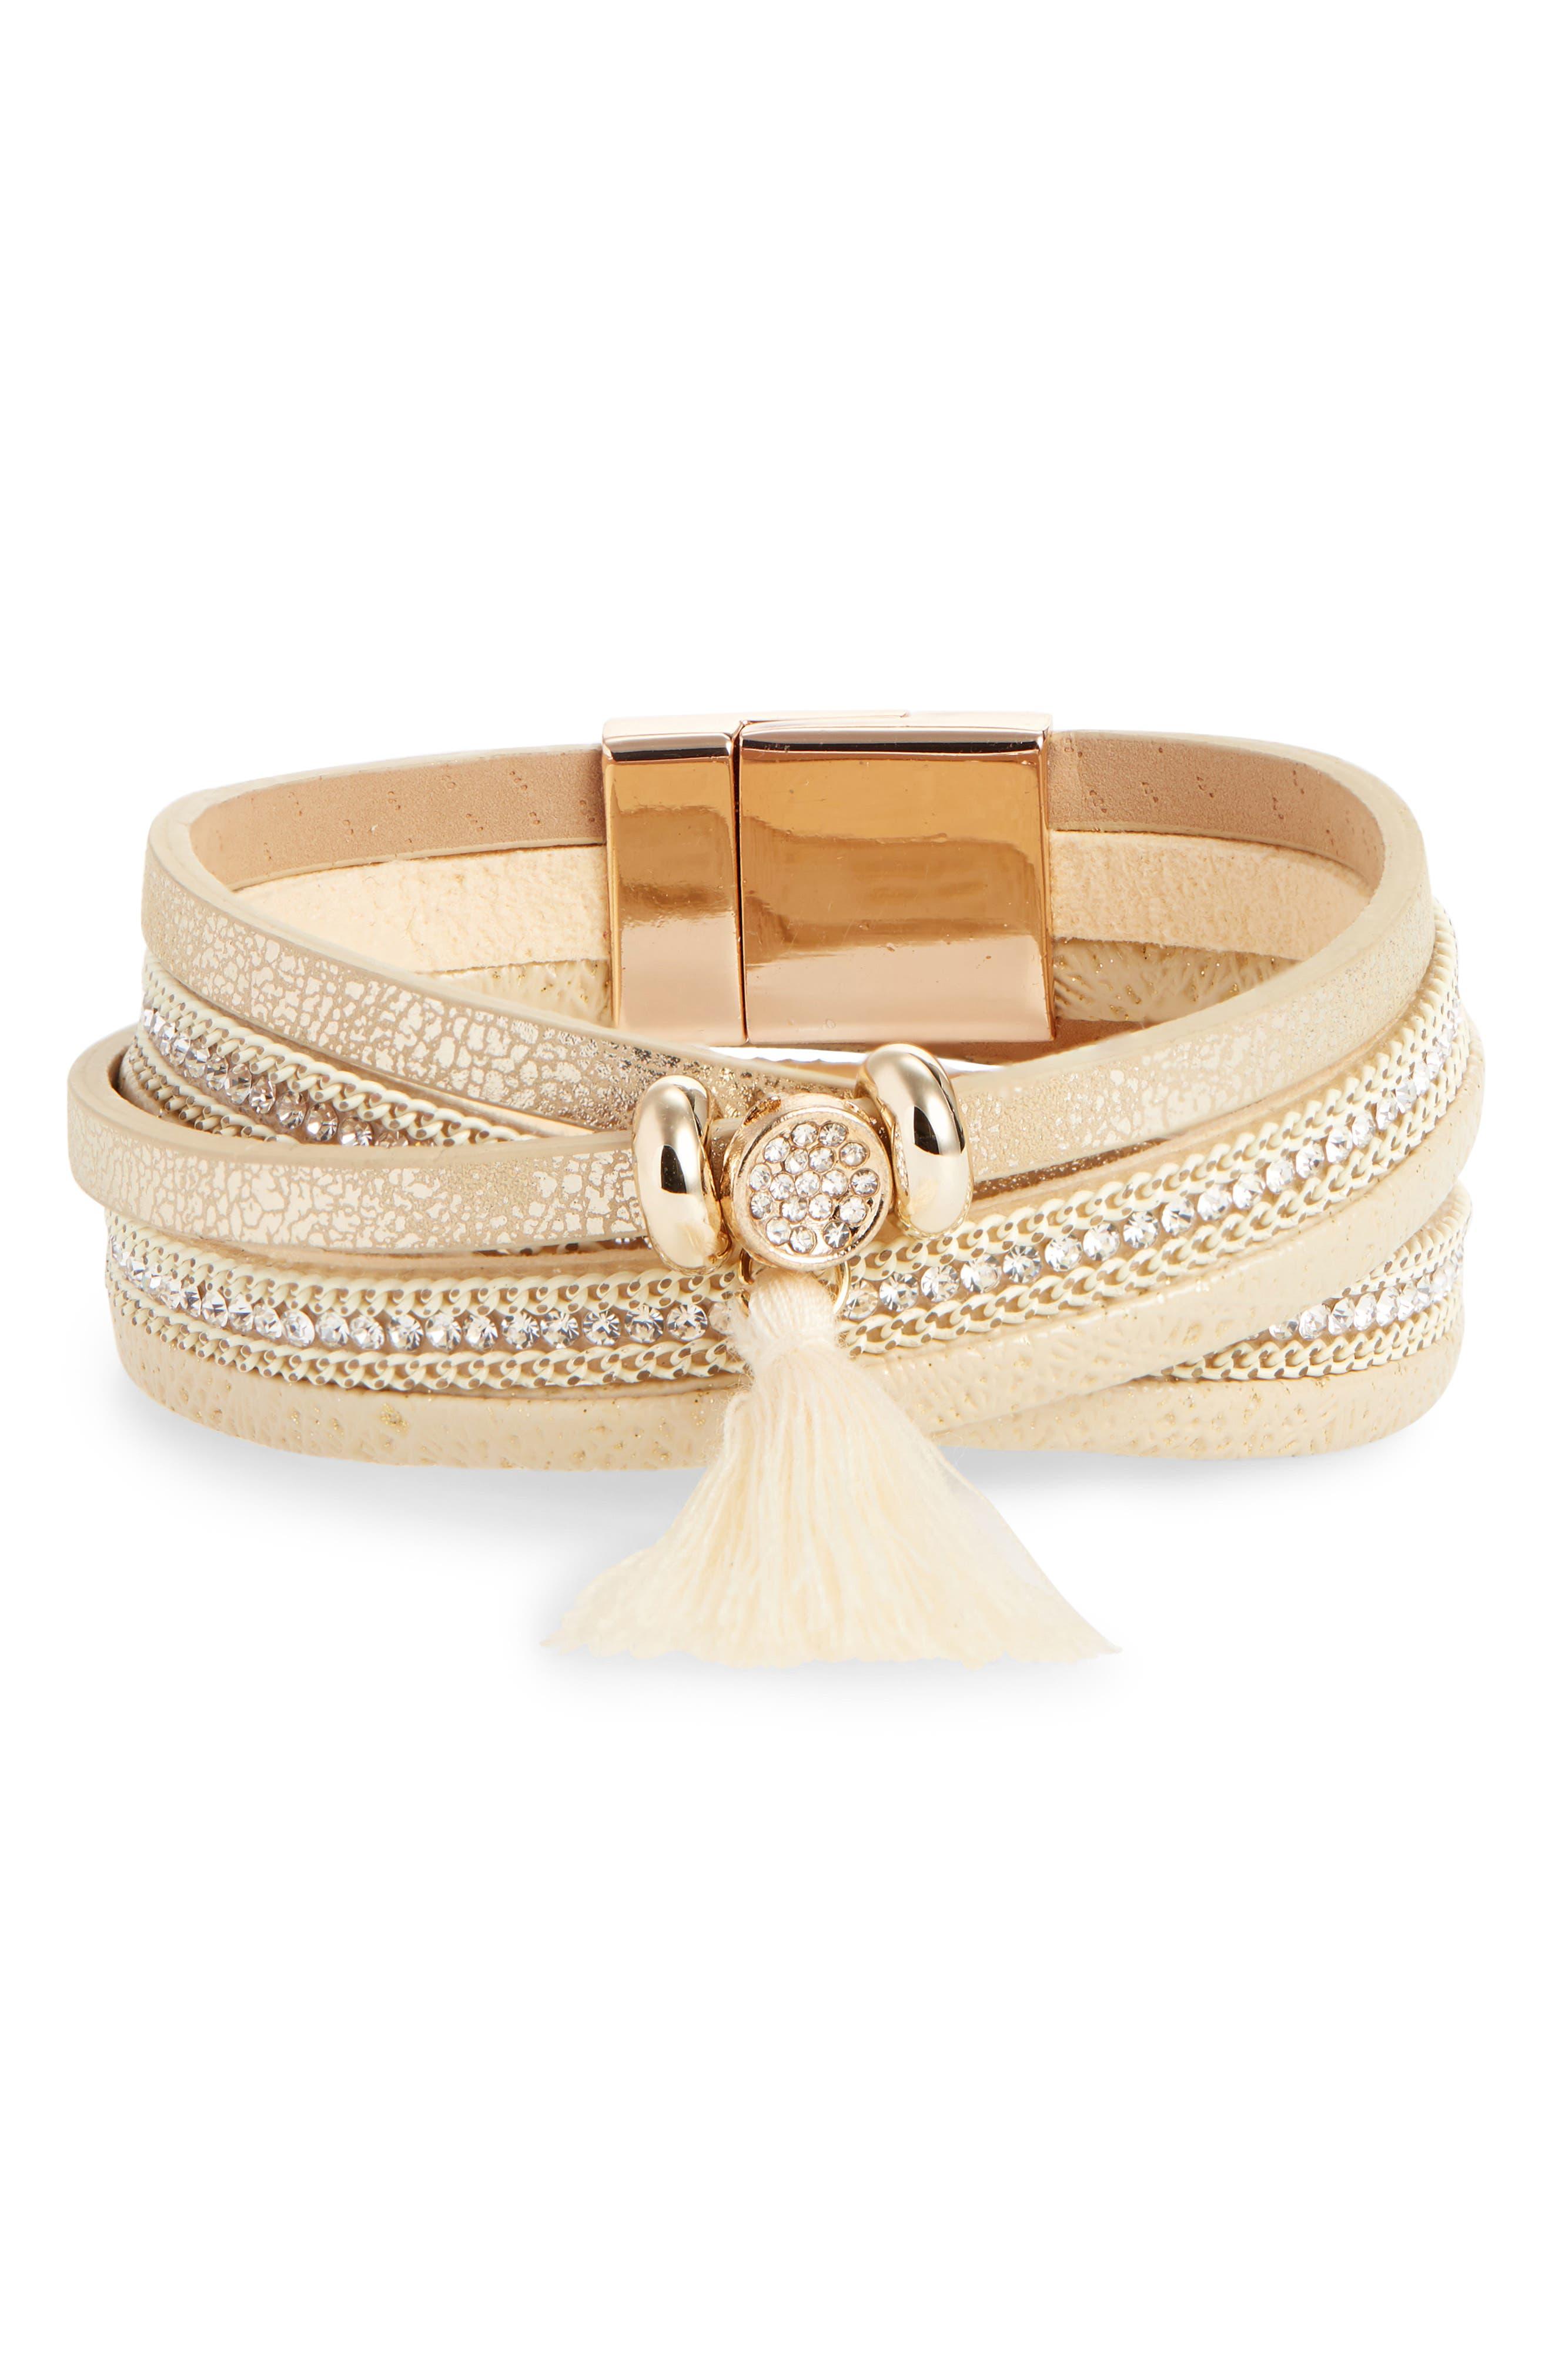 Tassel Leather & Crystal Multi Row Bracelet,                             Main thumbnail 1, color,                             GOLD/ IVORY